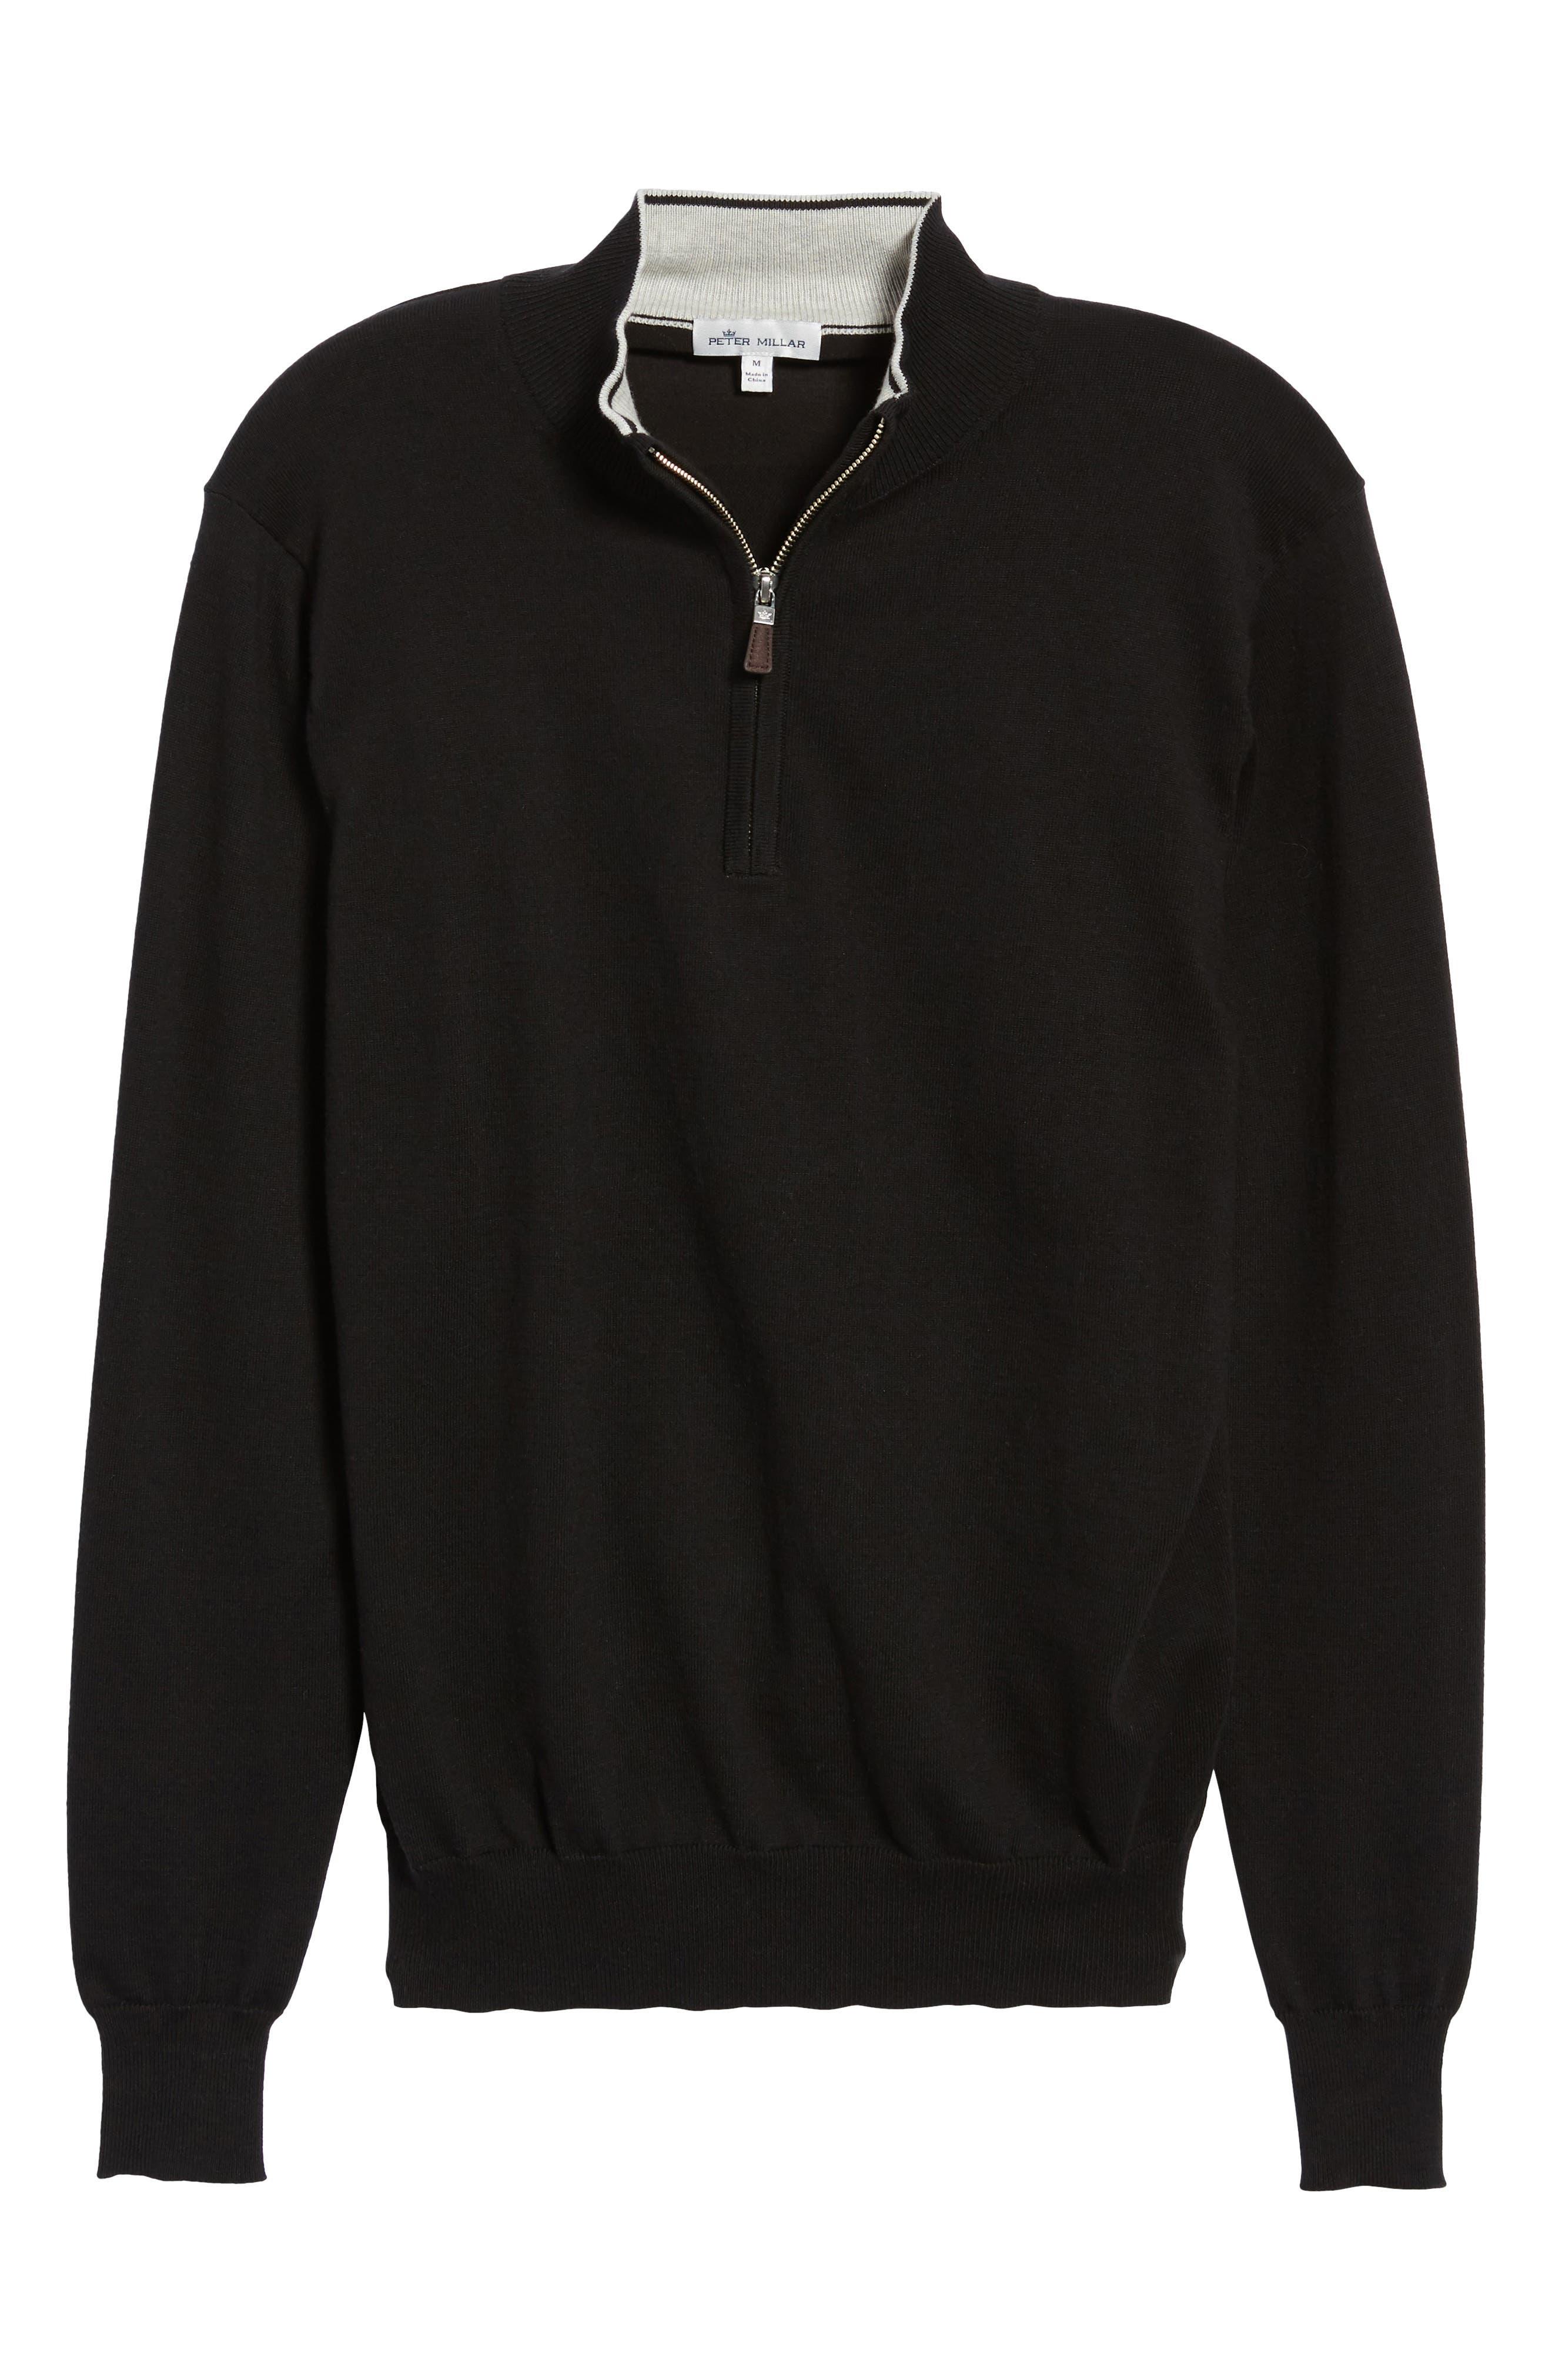 PETER MILLAR,                             Crown Quarter Zip Sweater,                             Alternate thumbnail 6, color,                             BLACK